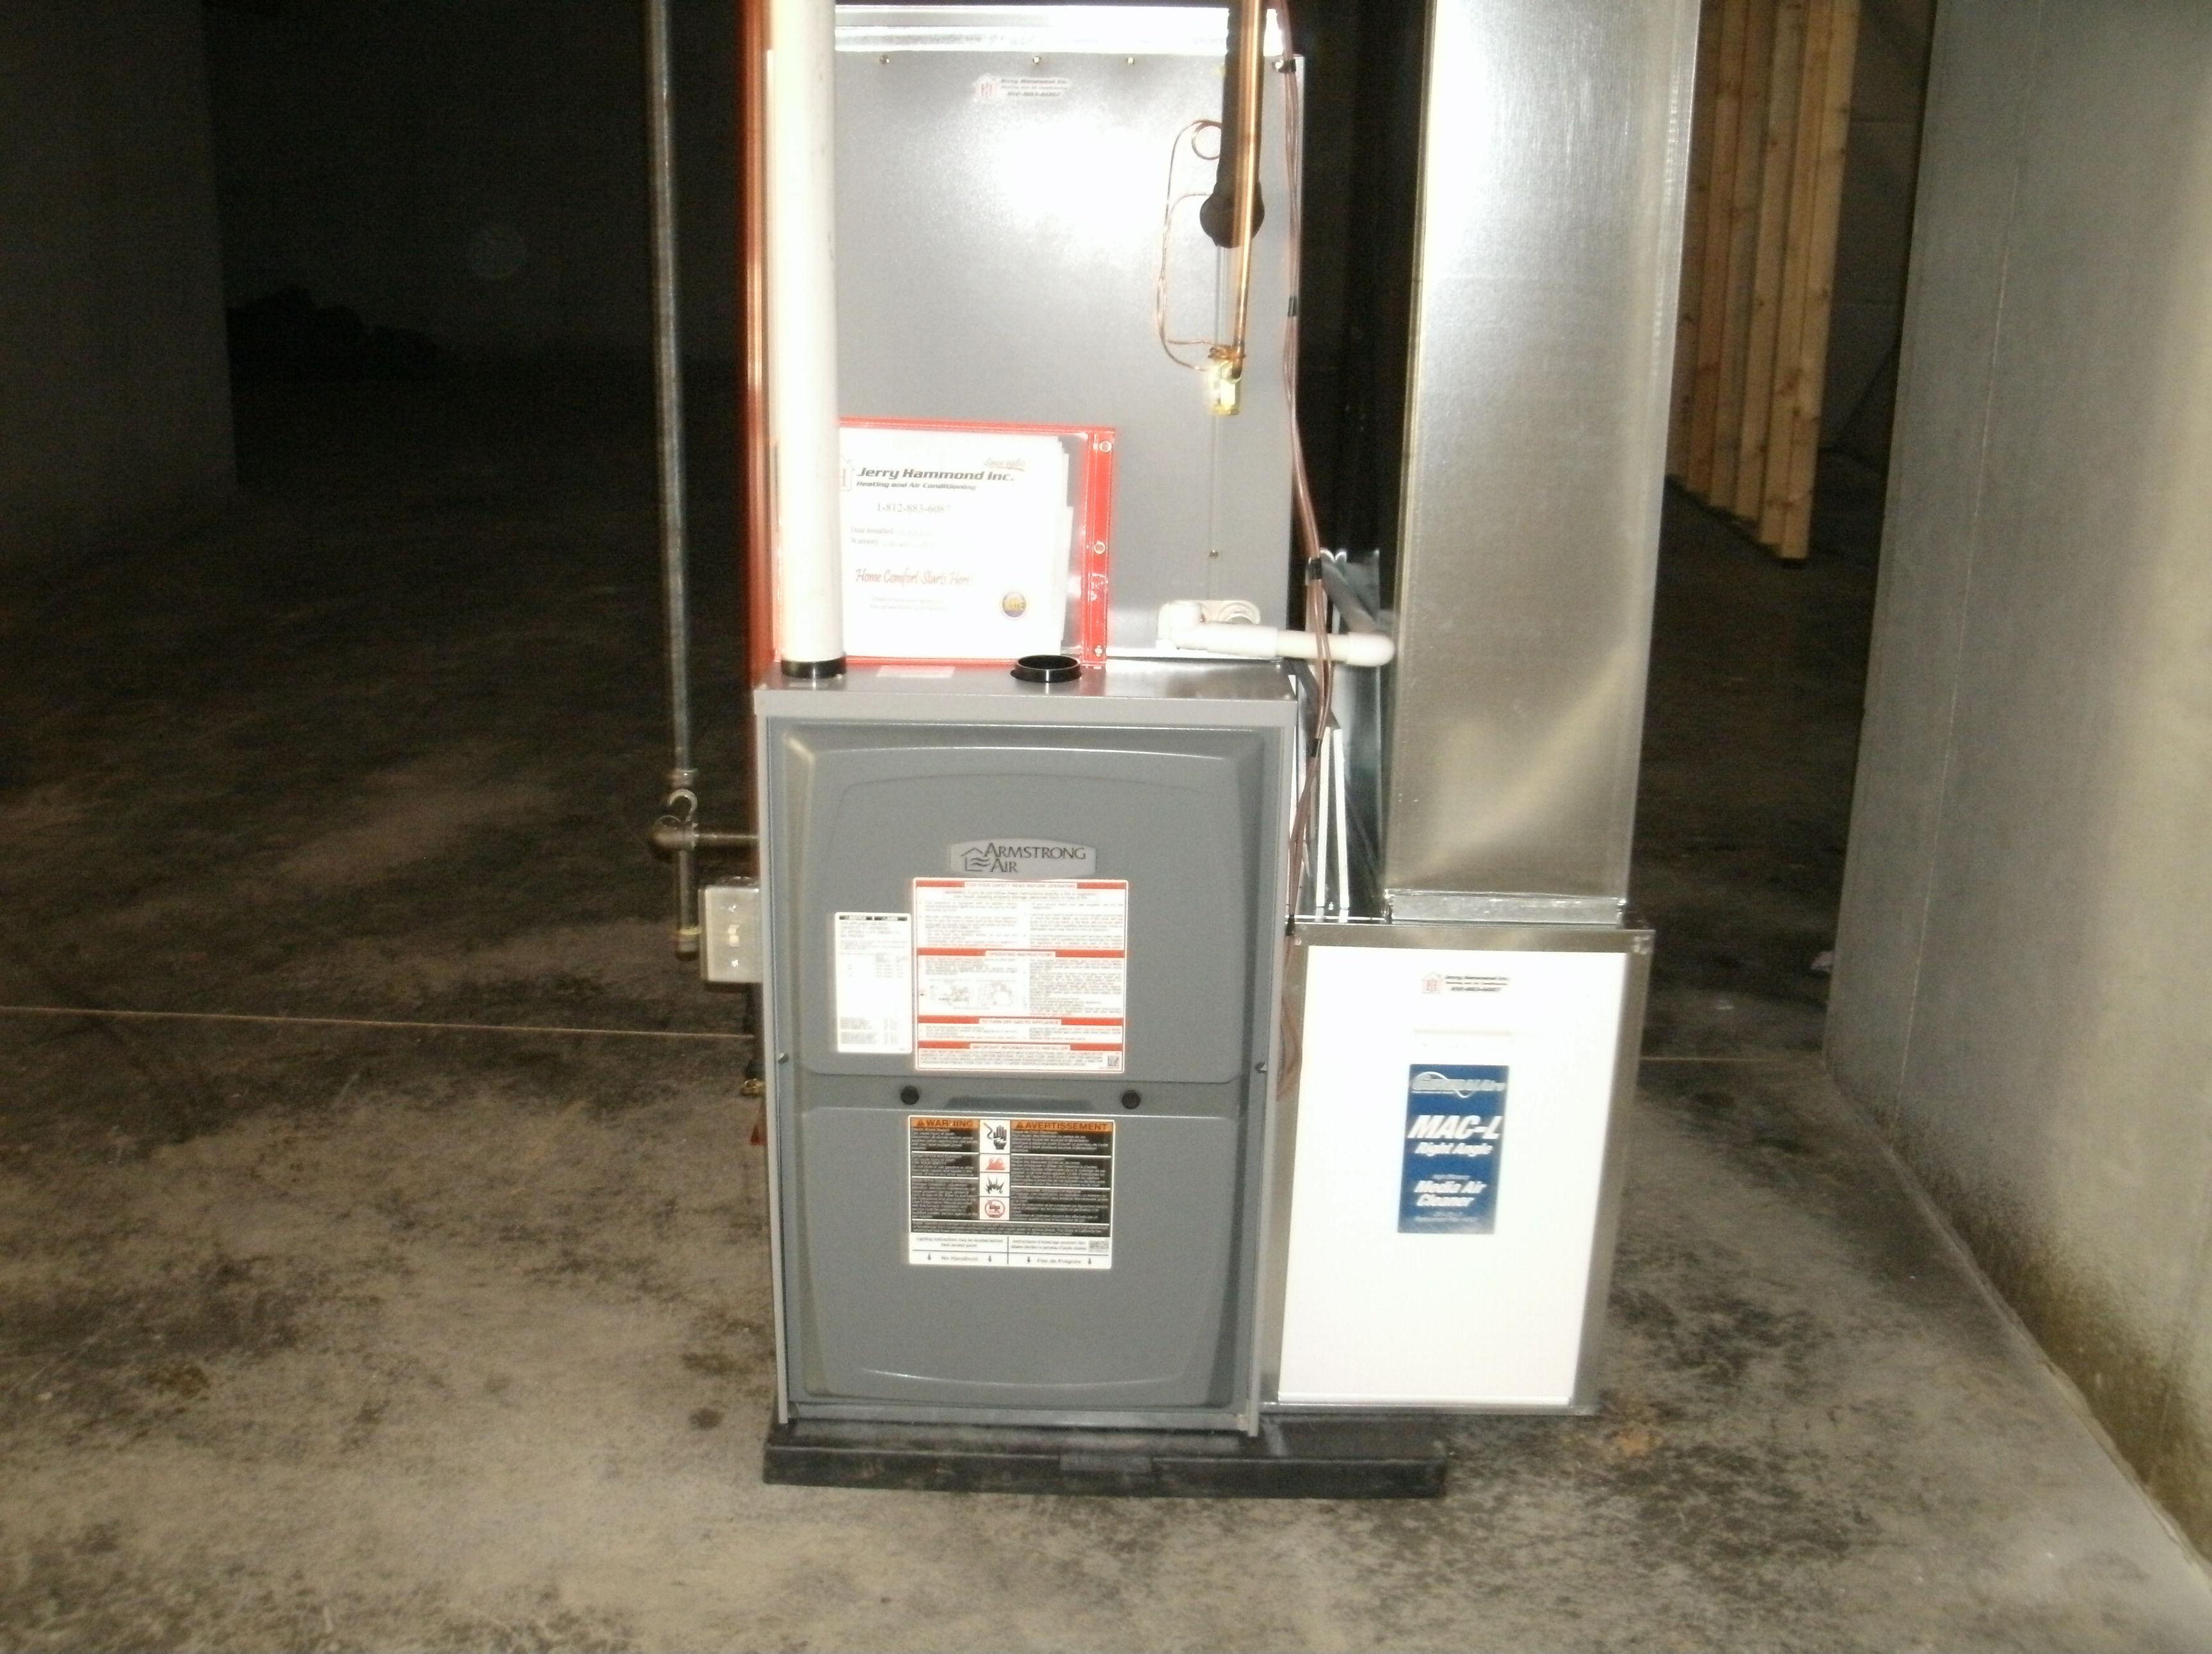 97% Modulating Gas Furnace